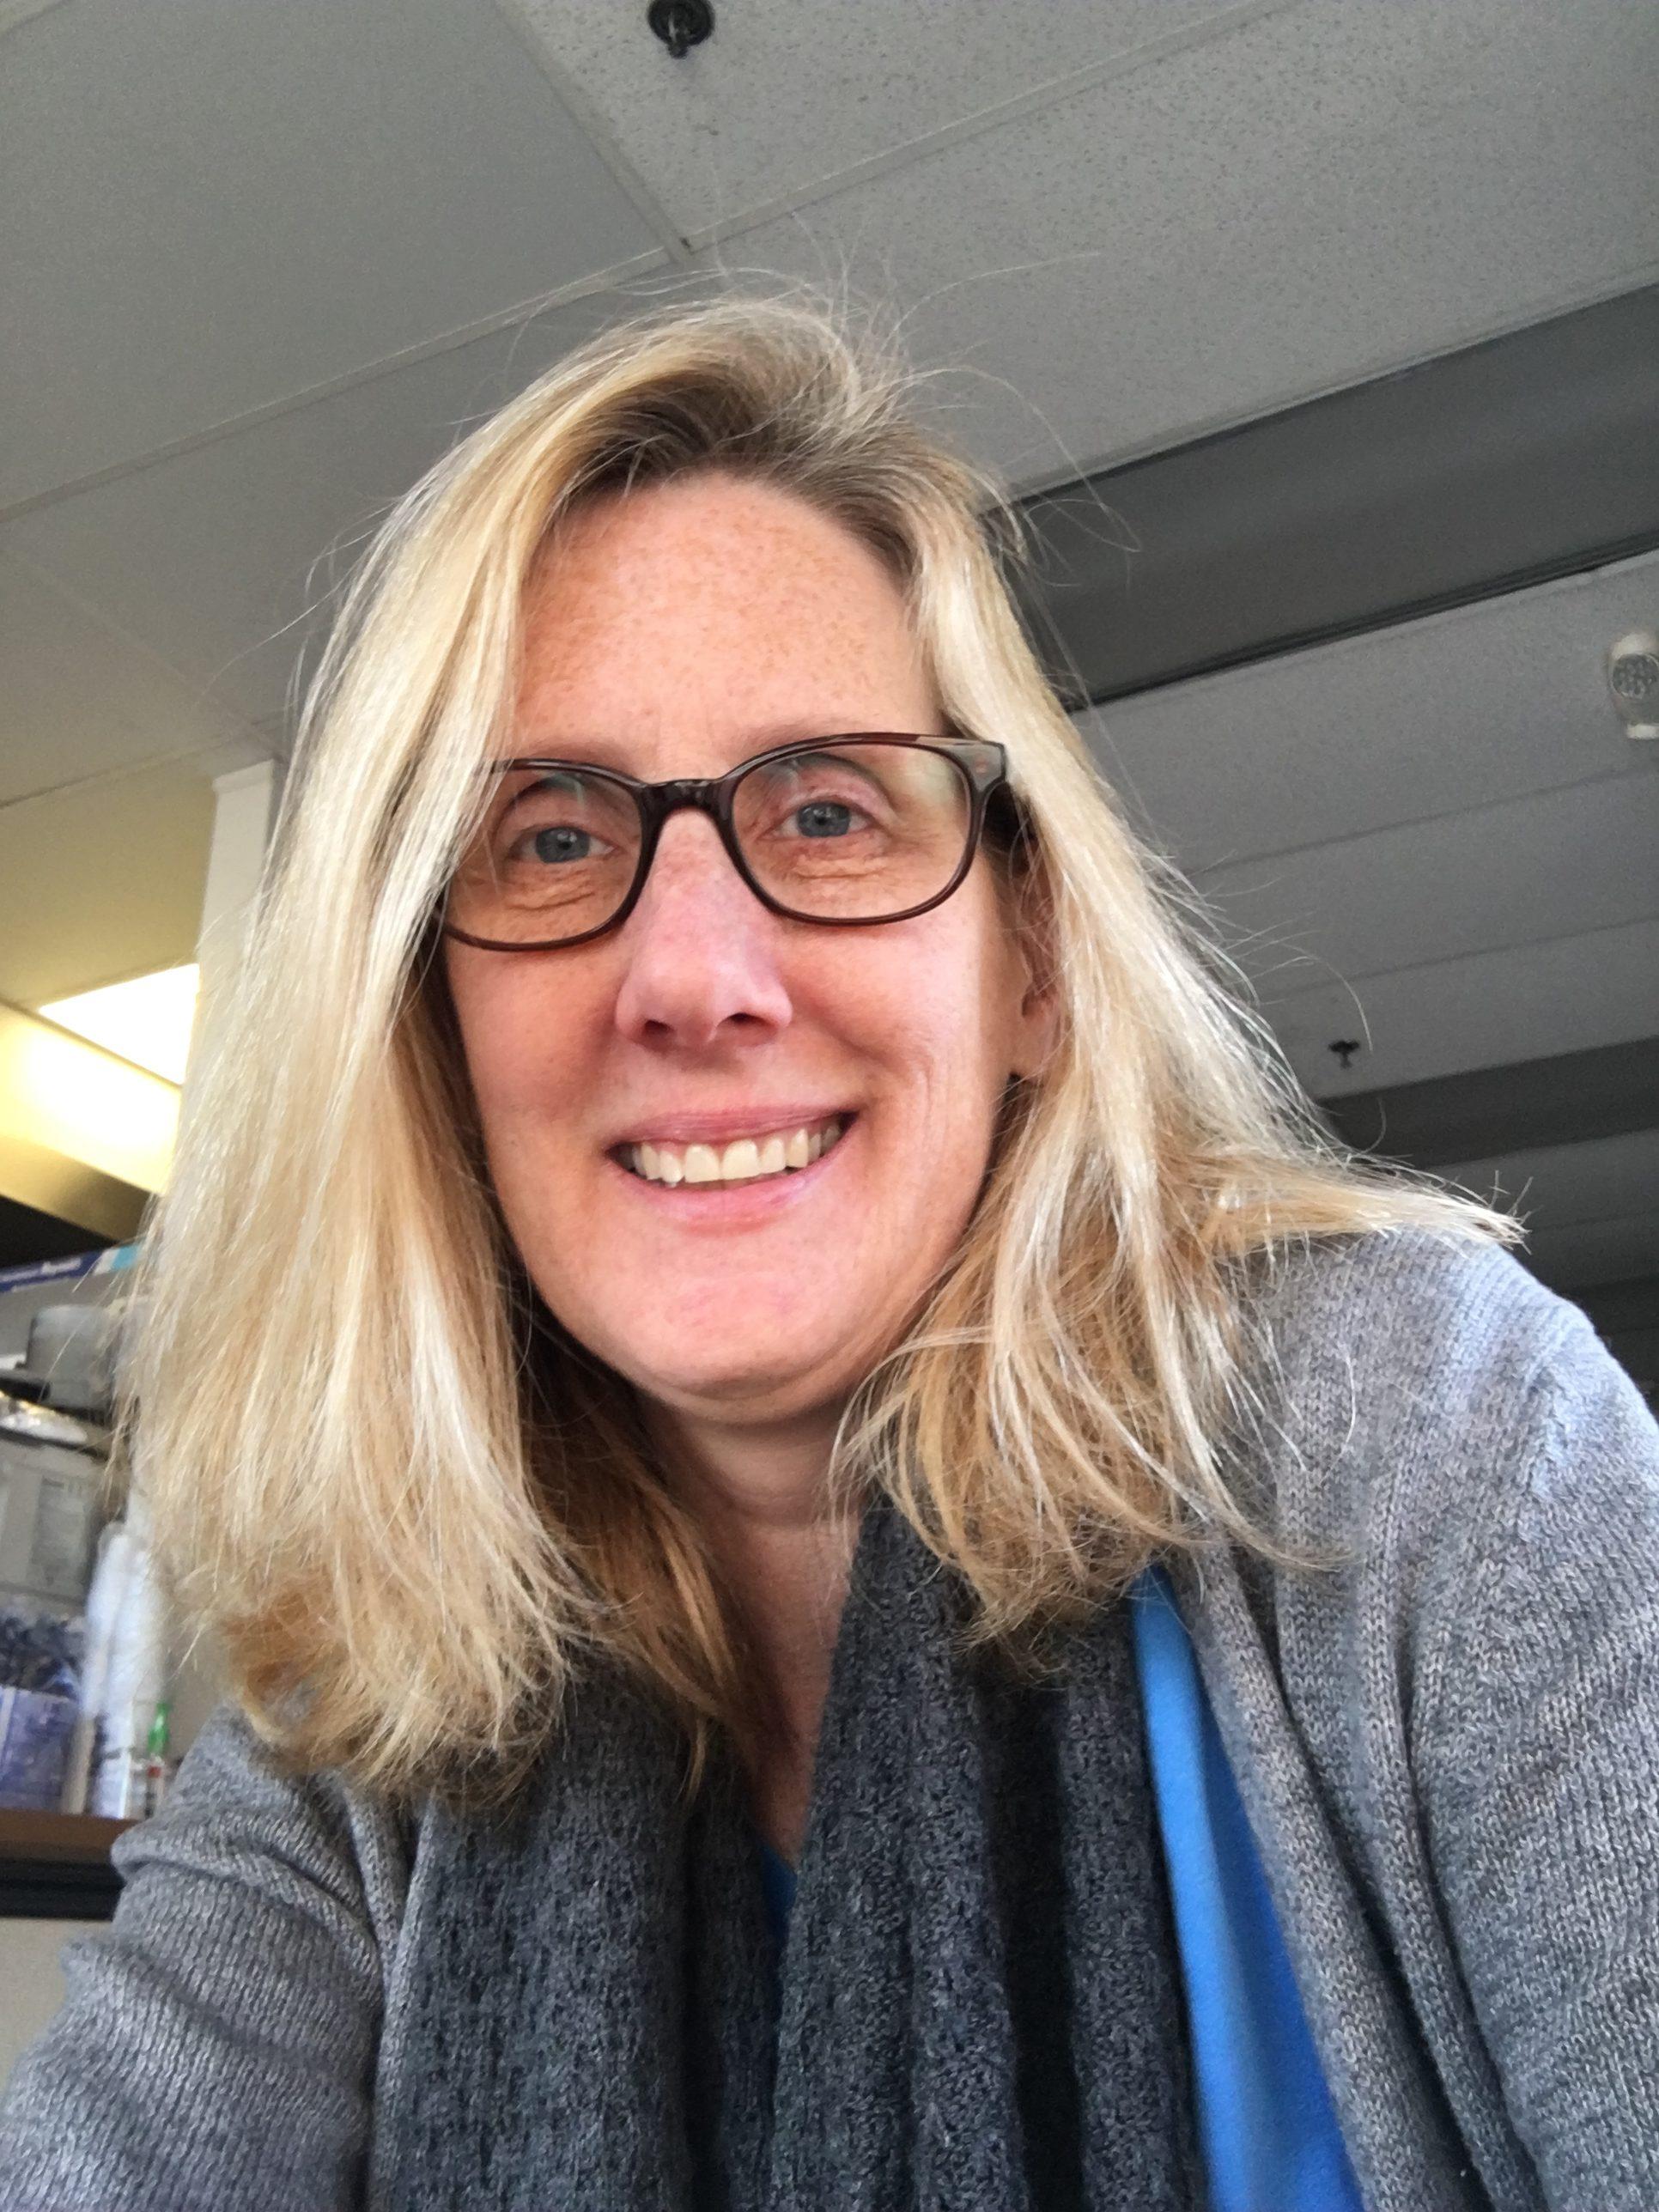 headshot of Ms. Mapp